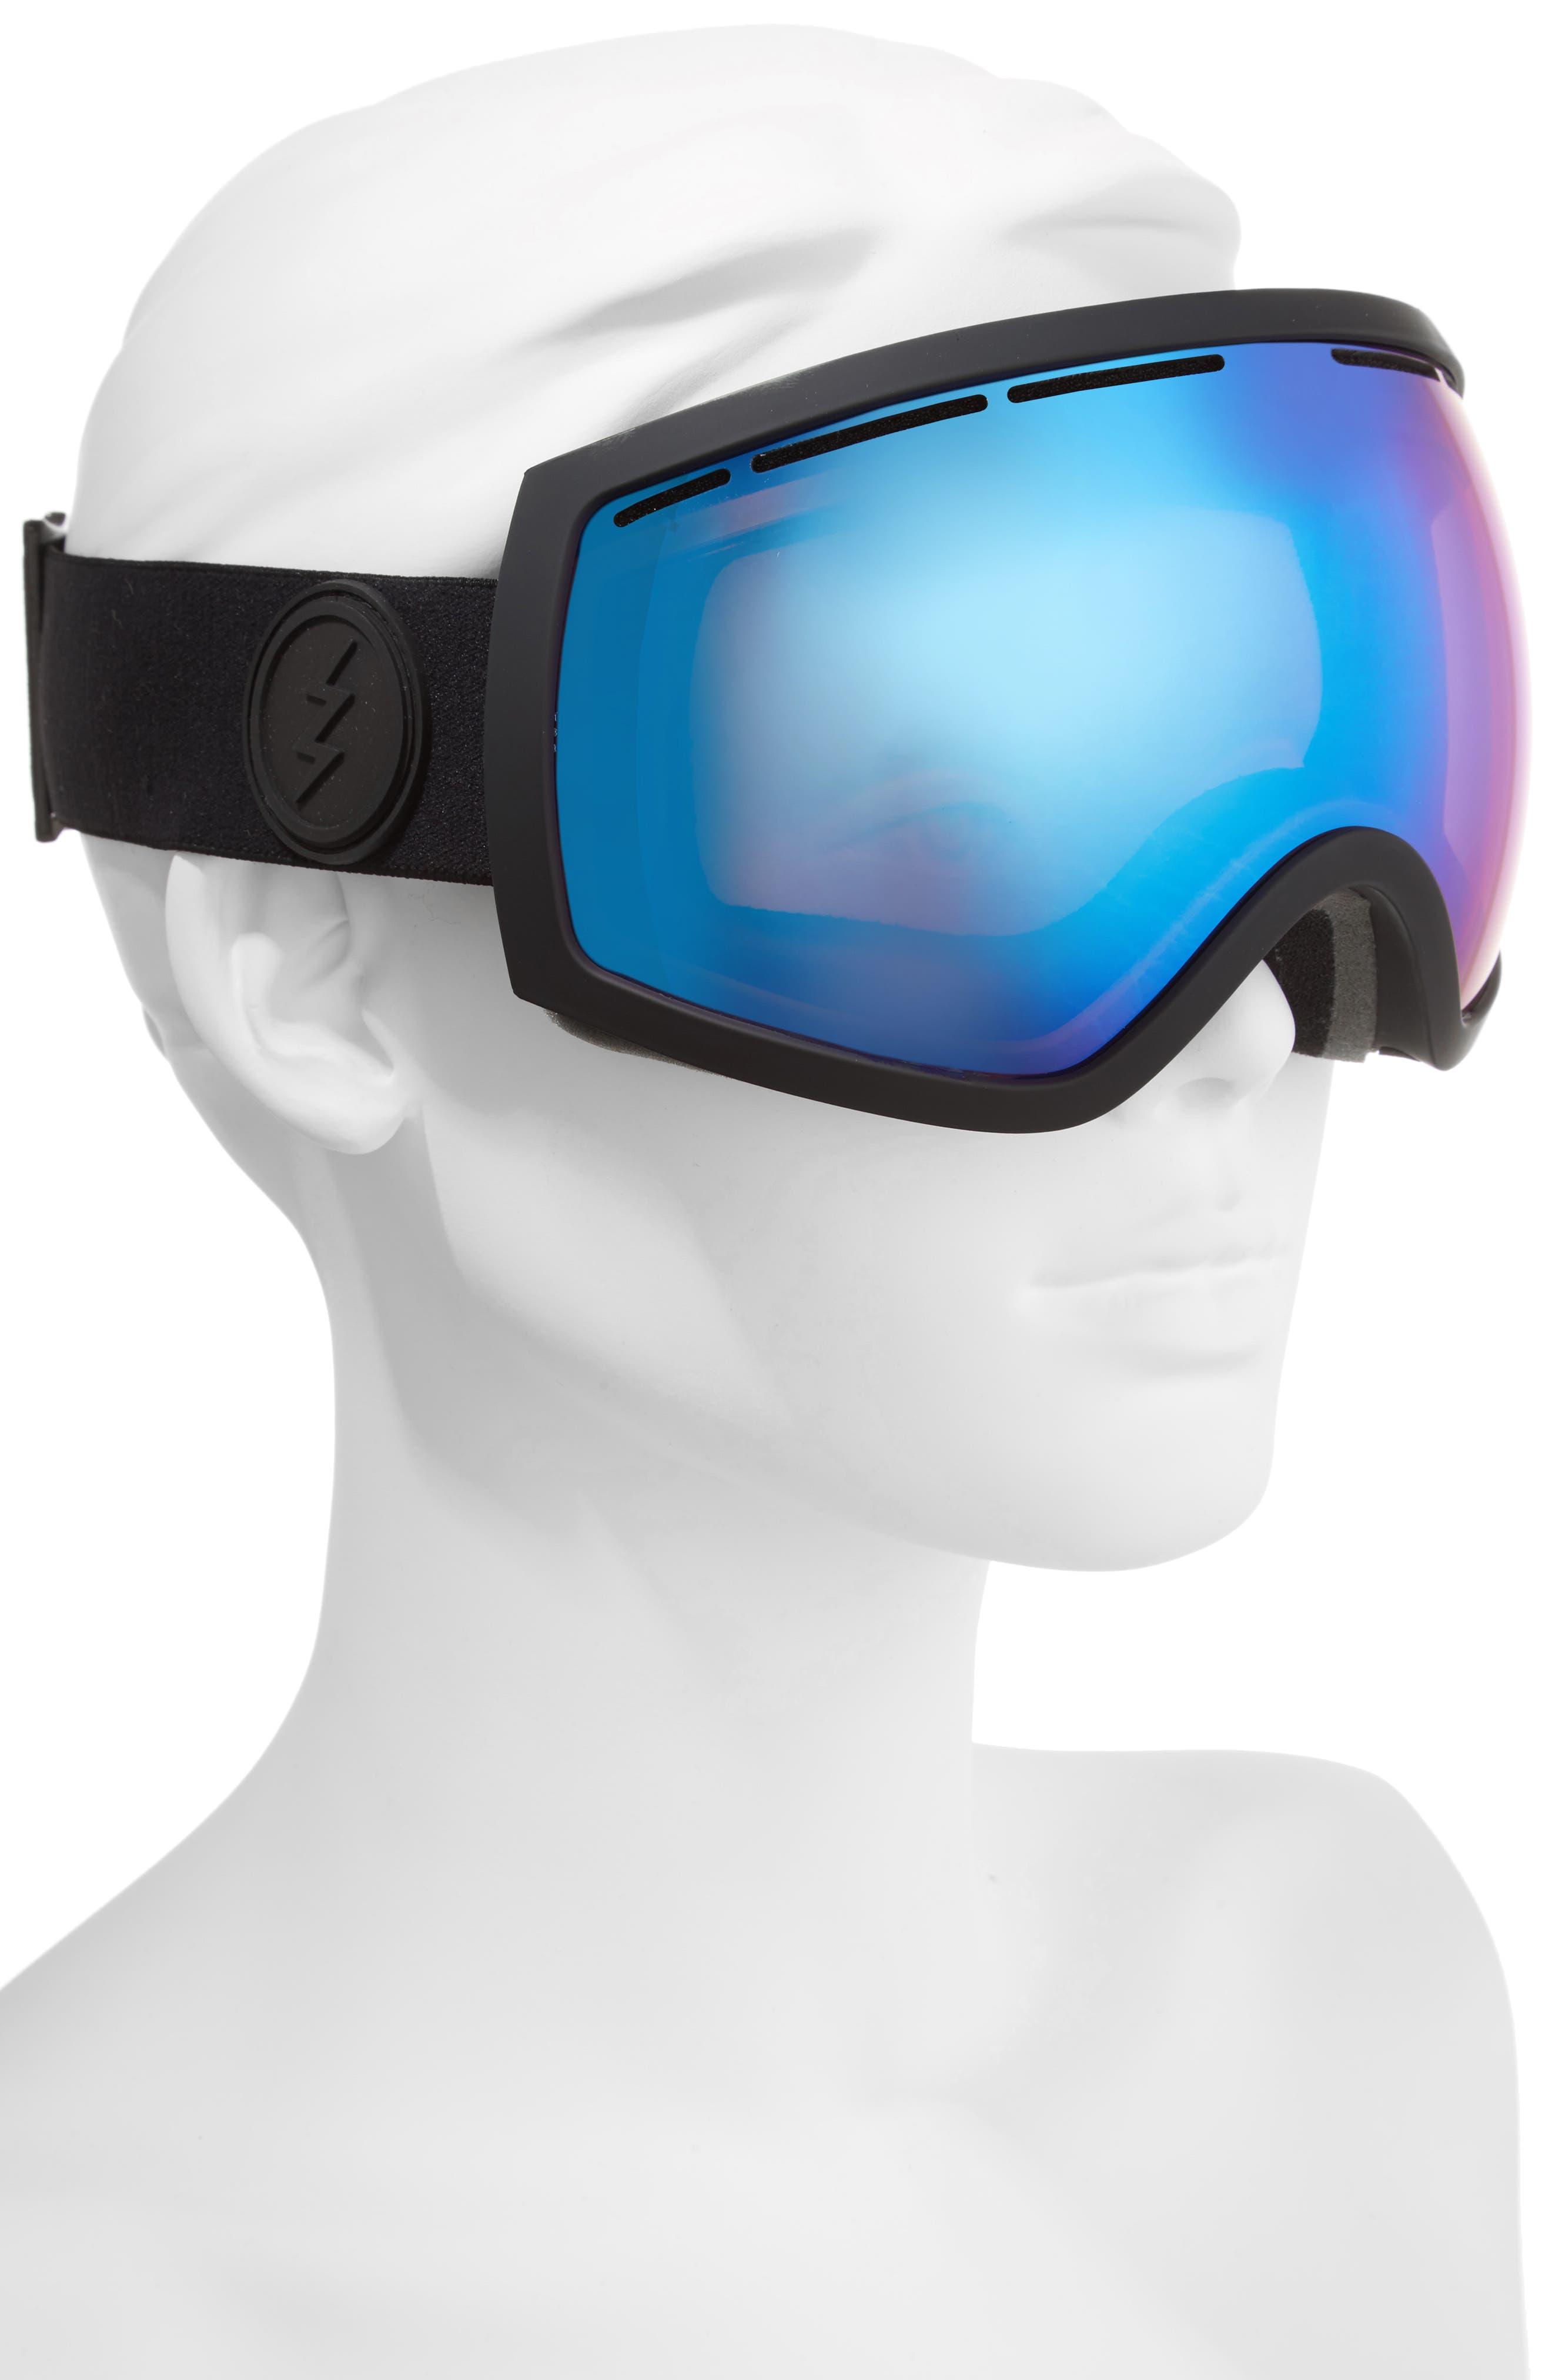 EG2 Snow Goggles,                             Alternate thumbnail 2, color,                             Matte Black/ Blue Chrome